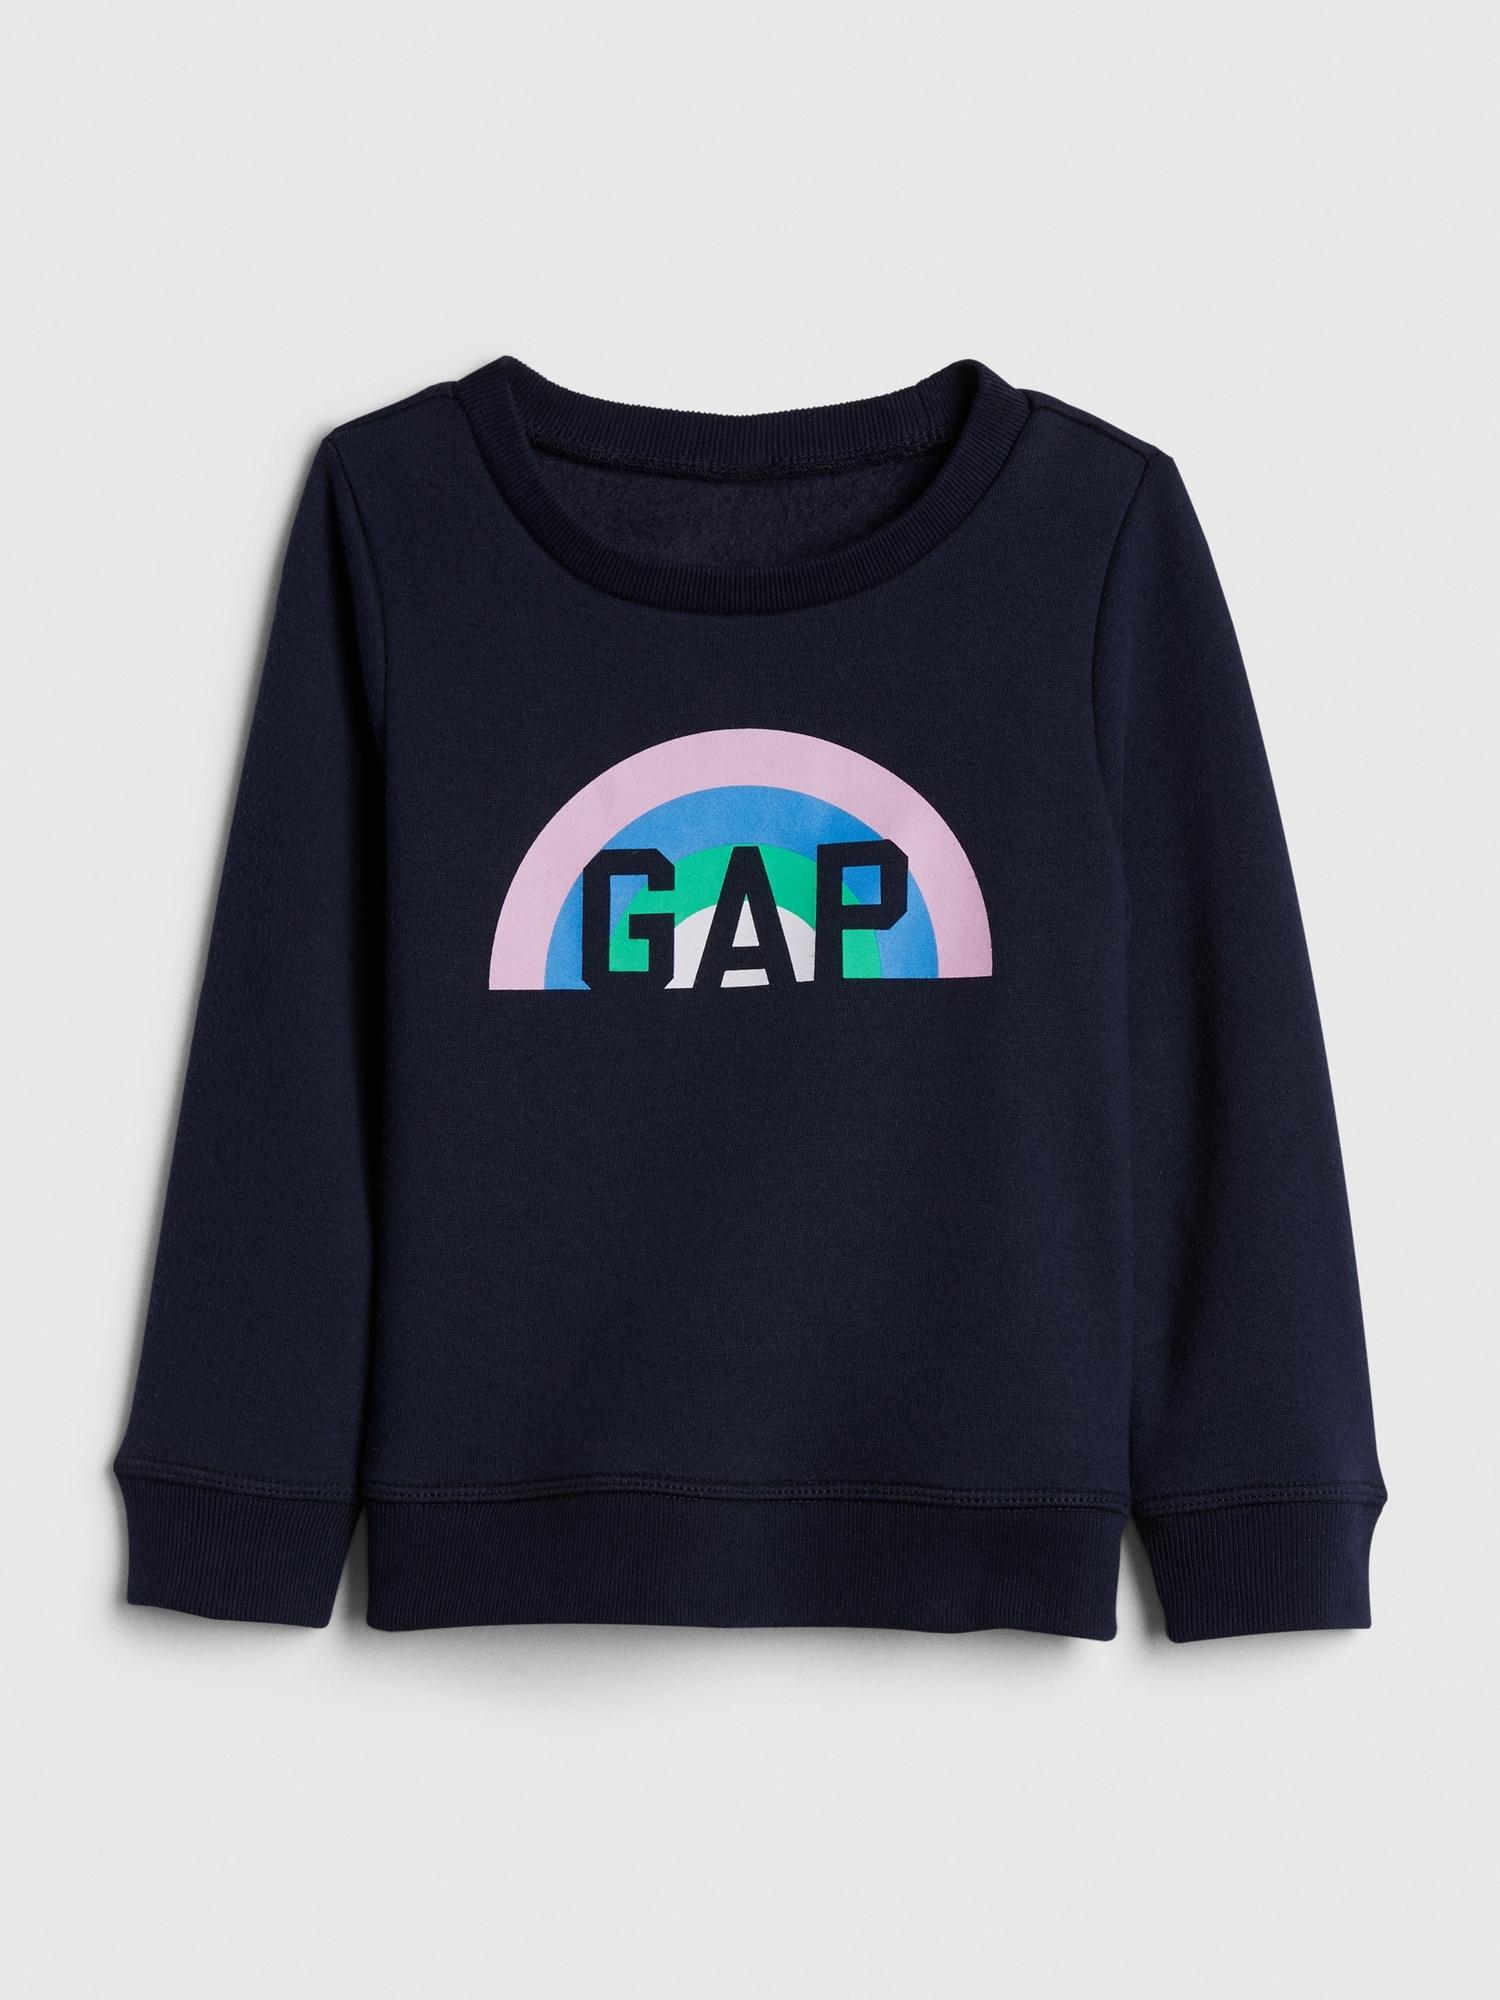 Gapロゴスウェットシャツ (幼児)